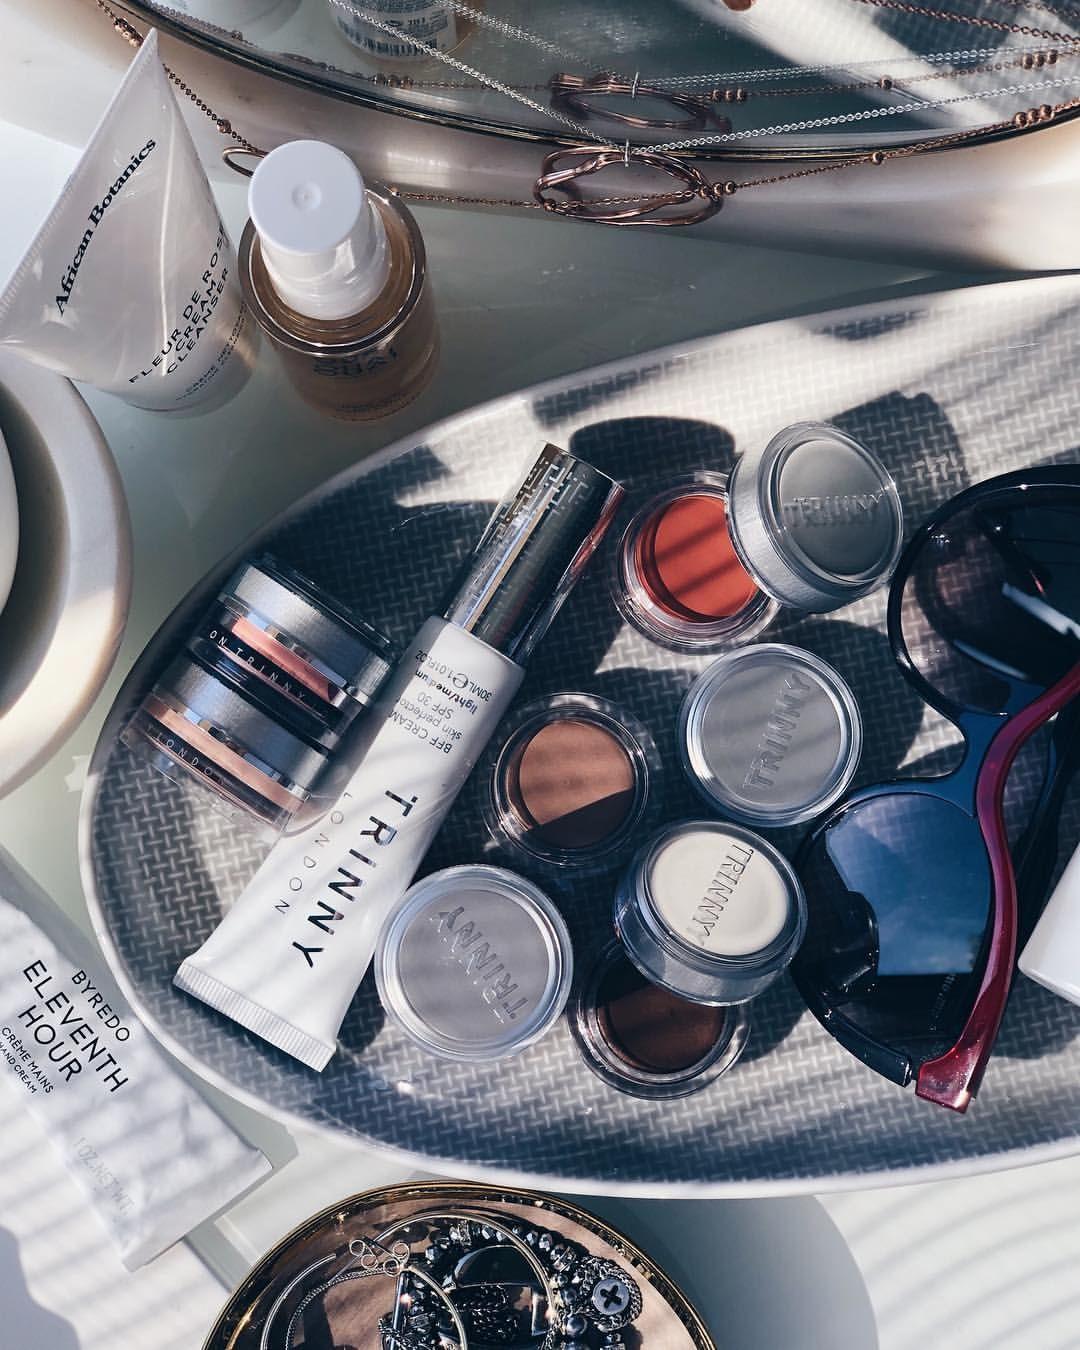 Cream based makeup, cream makeup, Trinny London, makeup